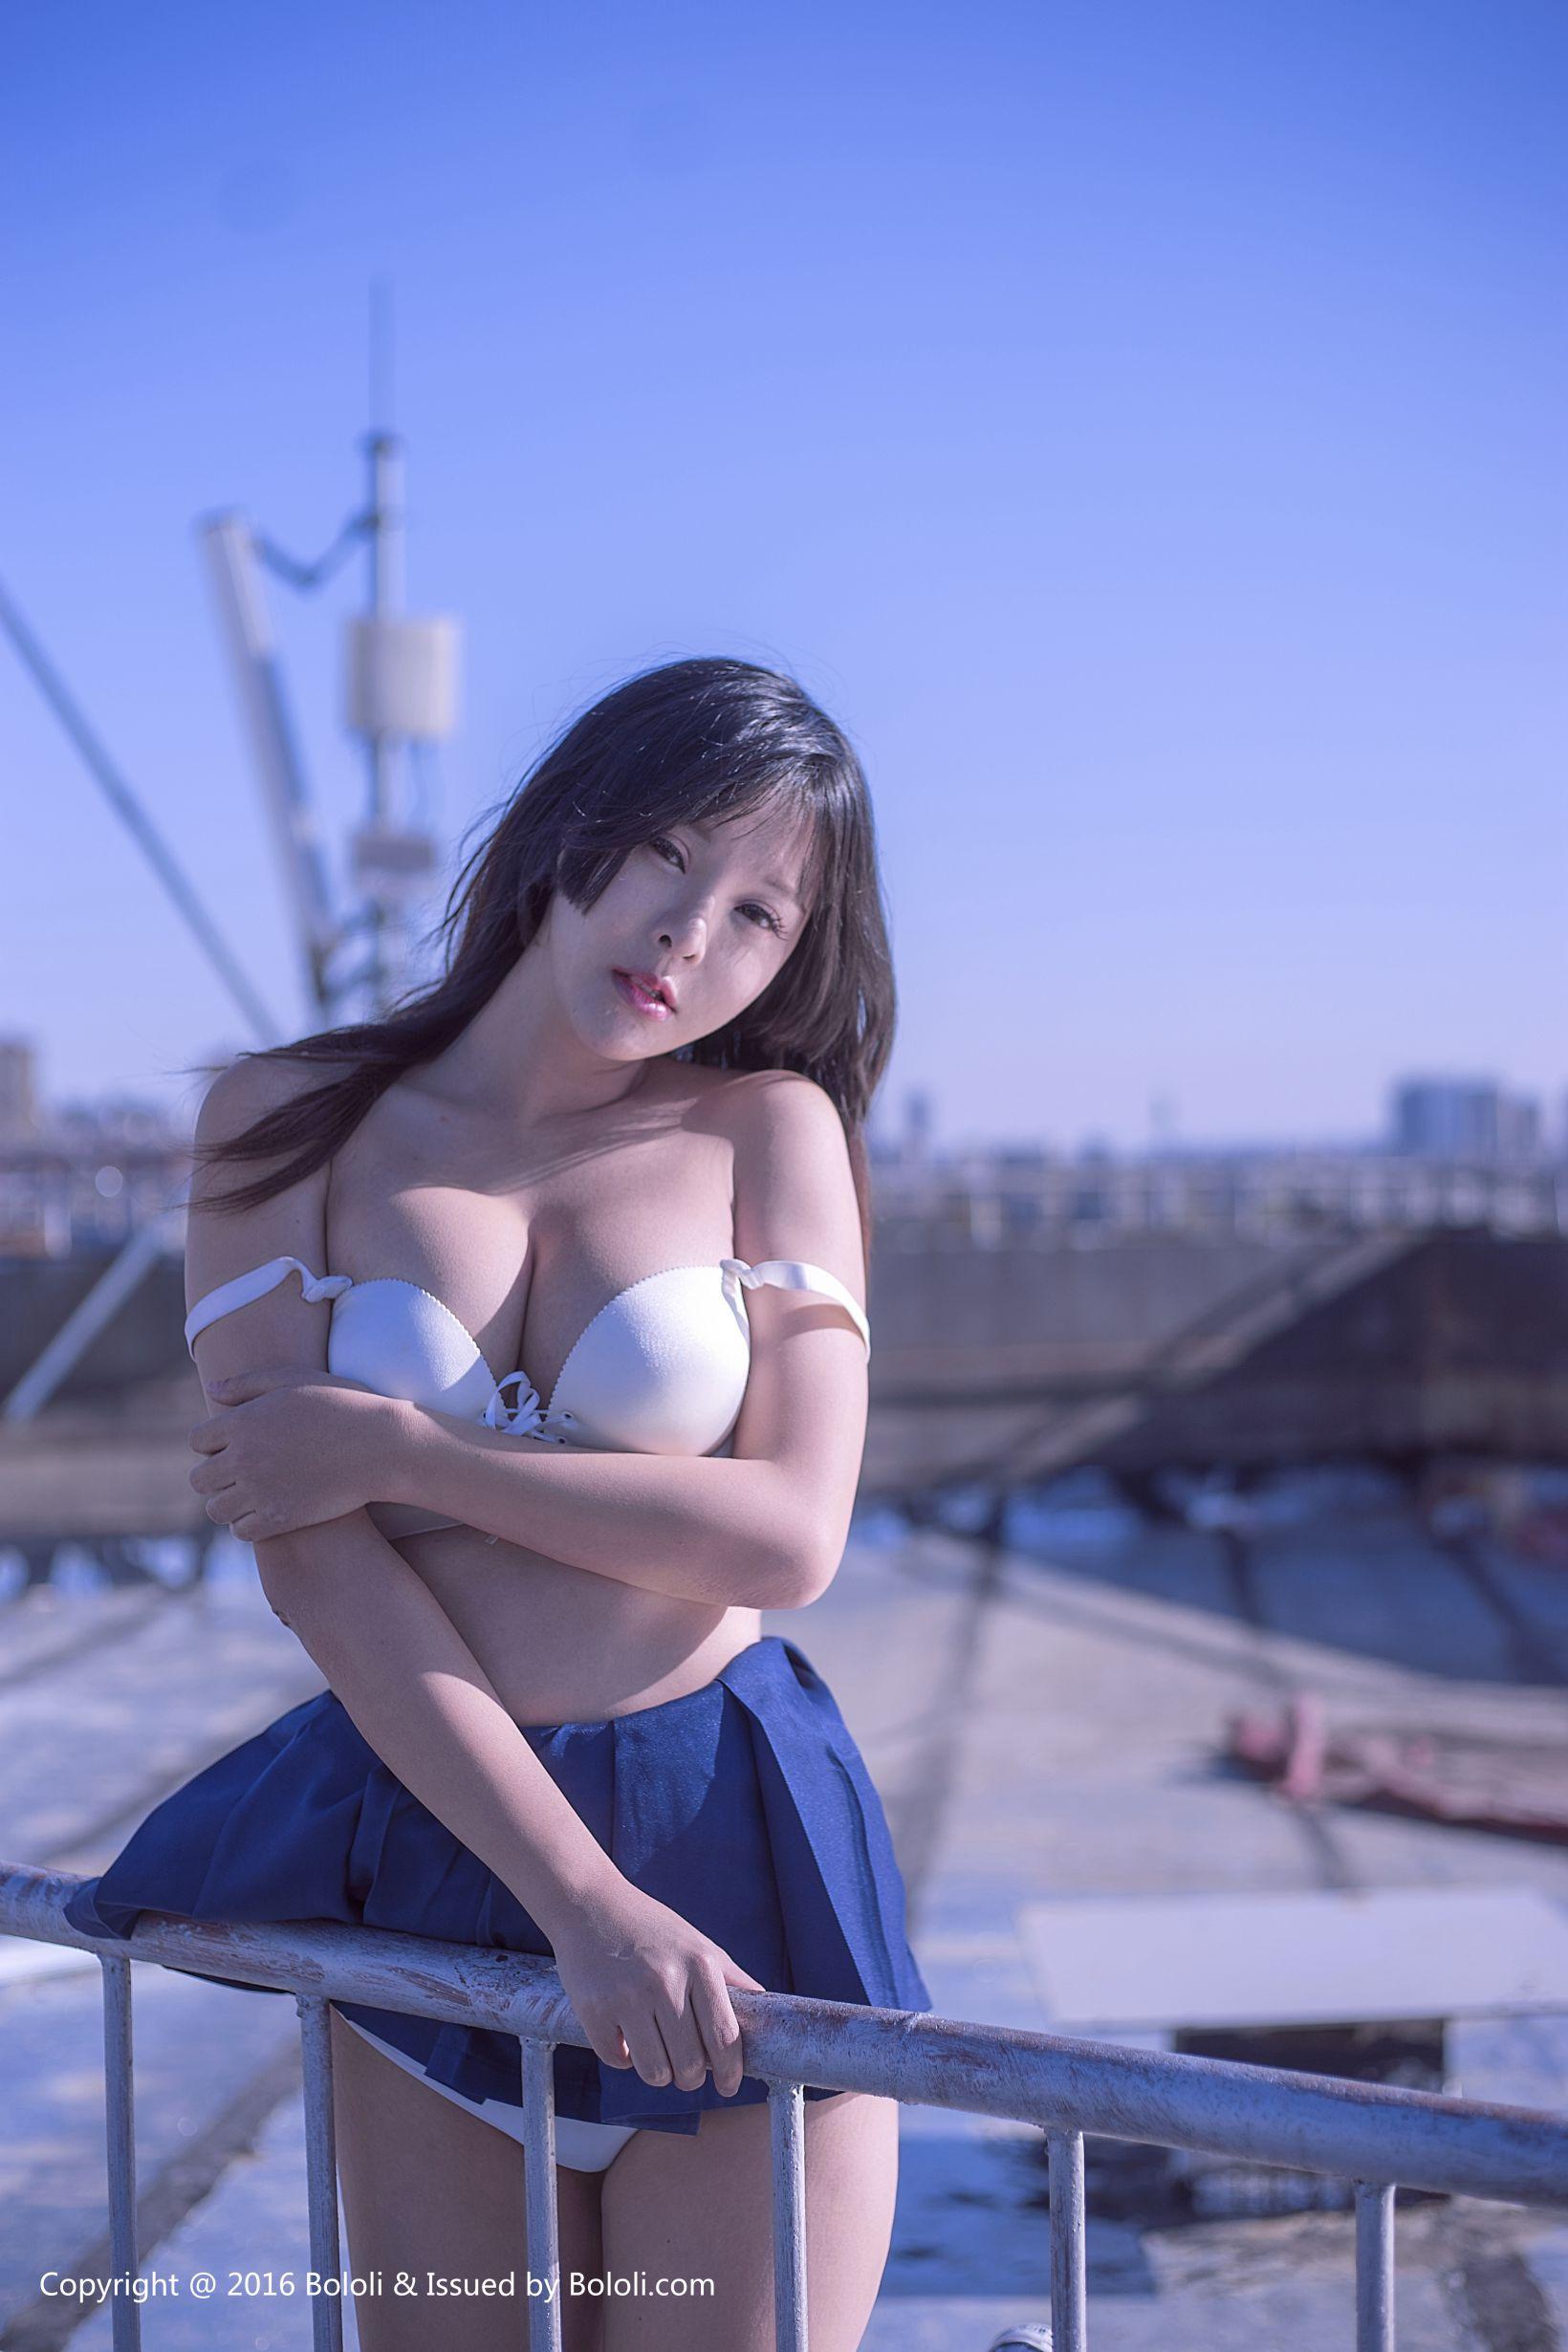 [BoLoLi波萝社] BOL055 菟菟Victoria - 菟菟的JK诱惑 丝袜美图图片[40P]